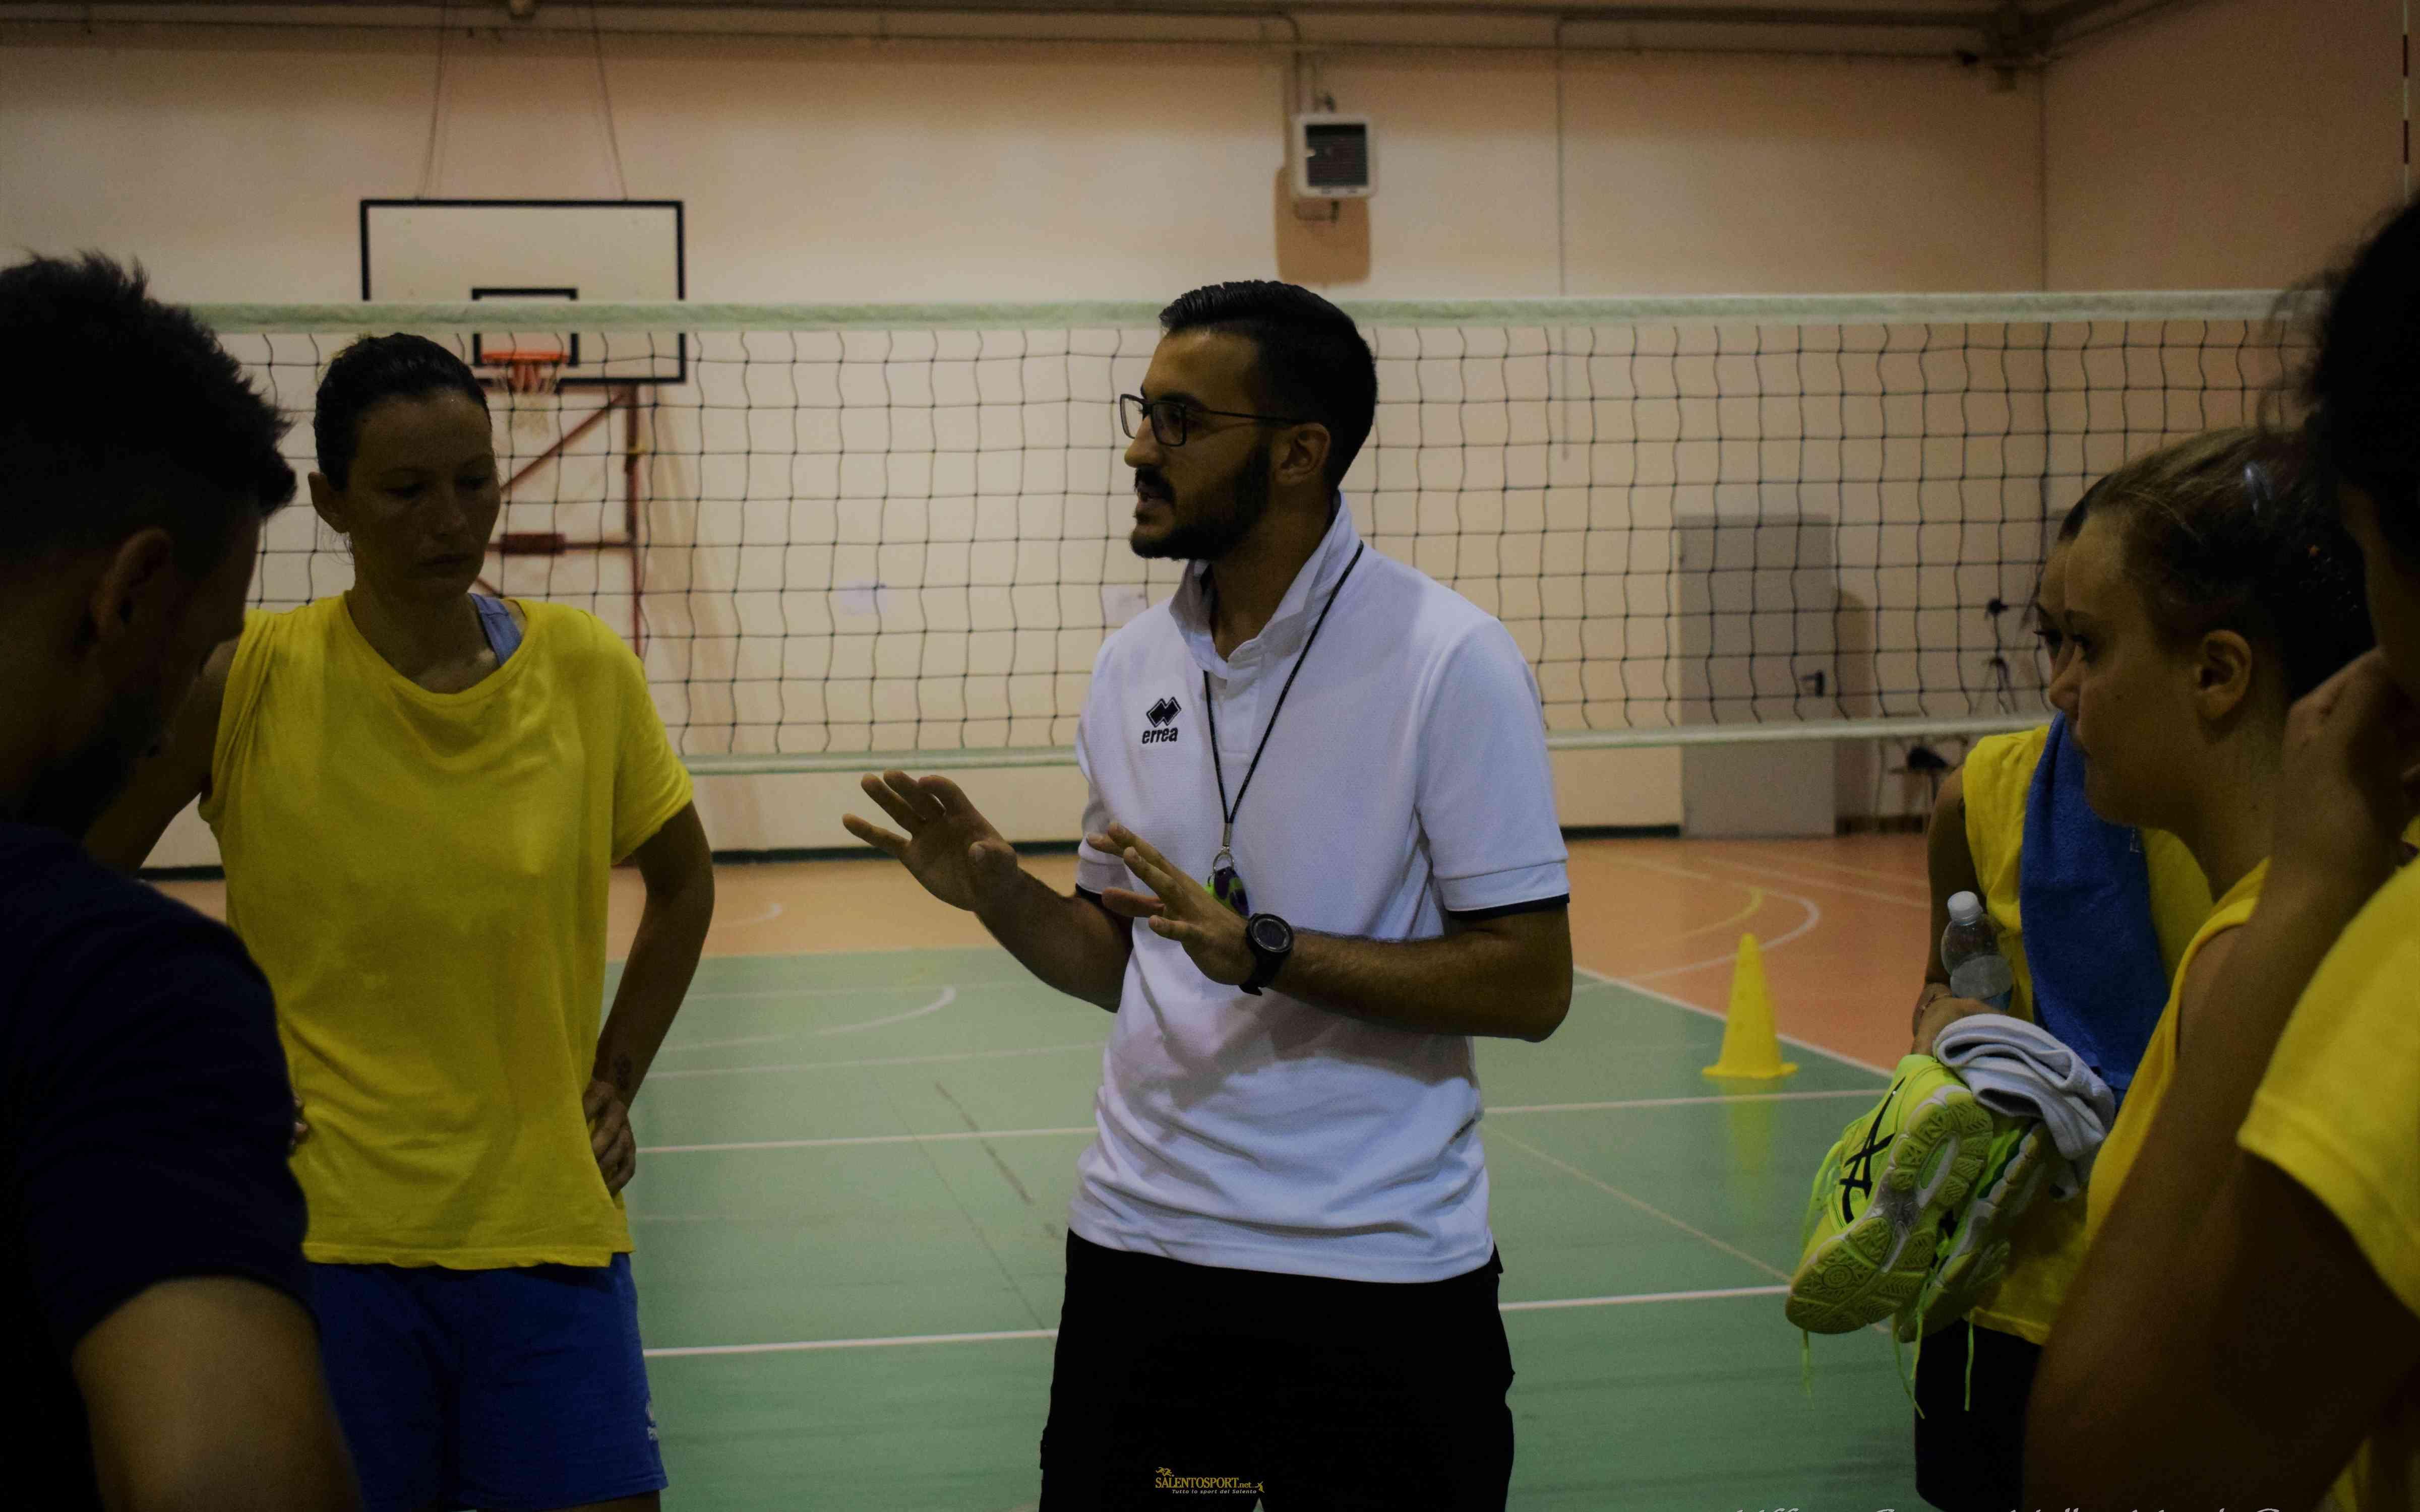 quarta-enrico-coach-magic-volley-copertino-jpg